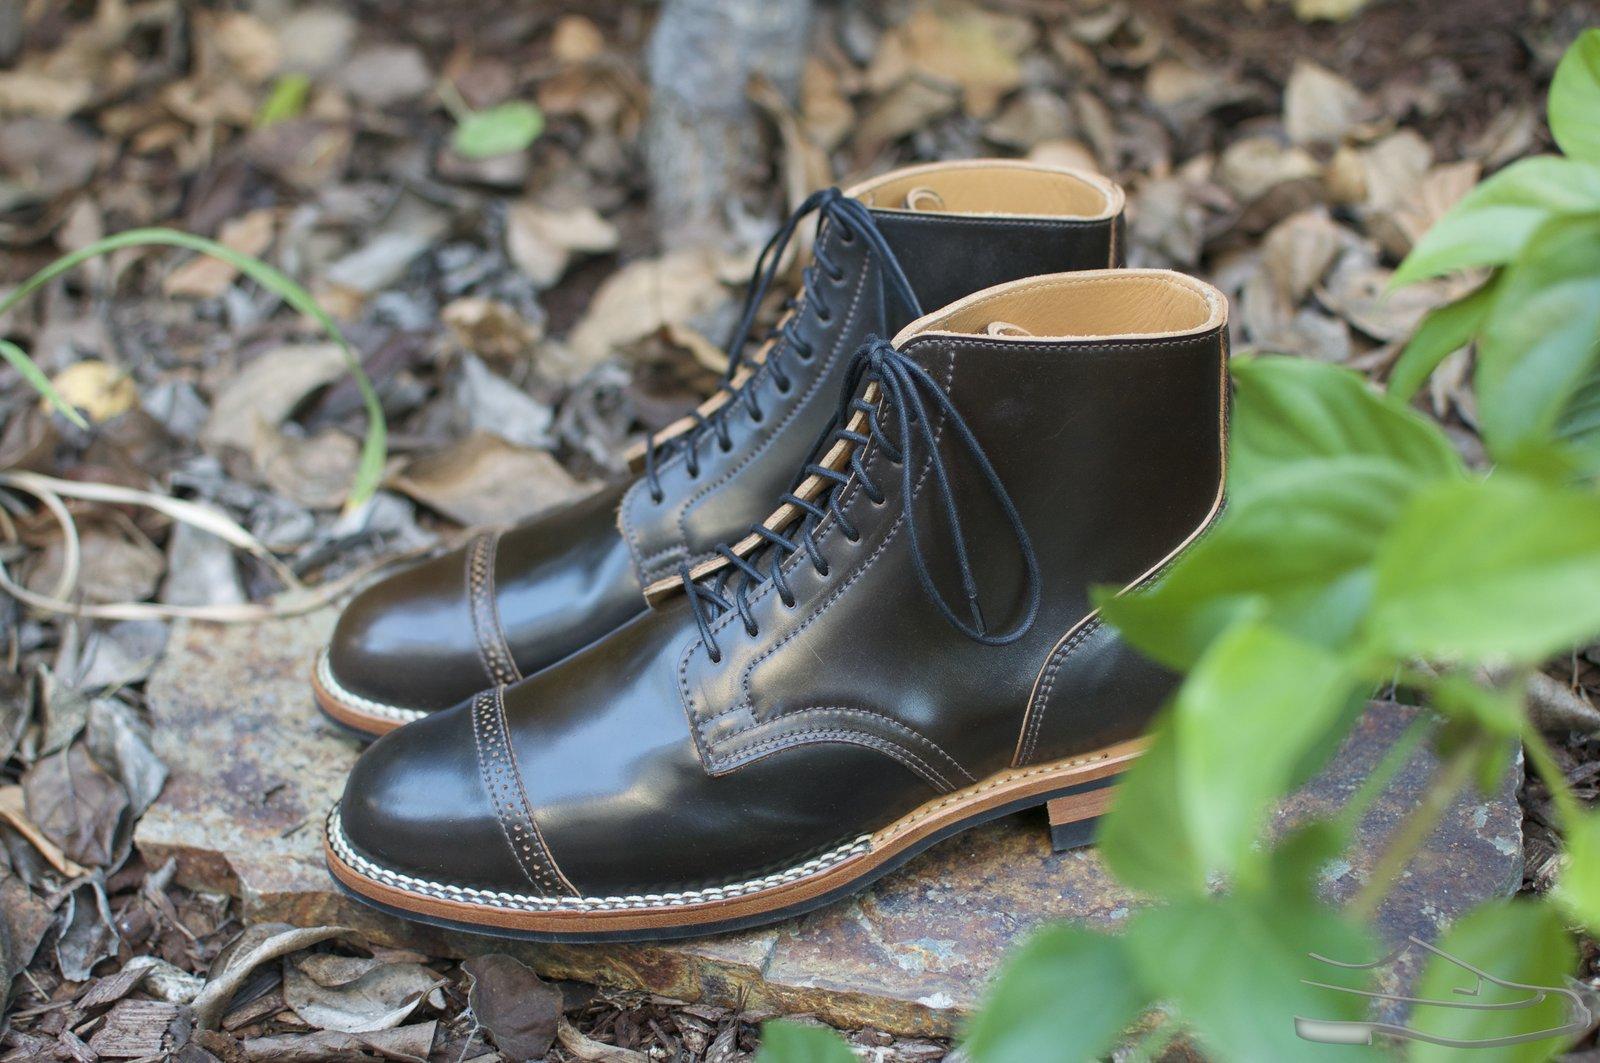 Viberg Dark Cognac Shell Cordovan Service Boots - 2020-10-30 - 3.jpg